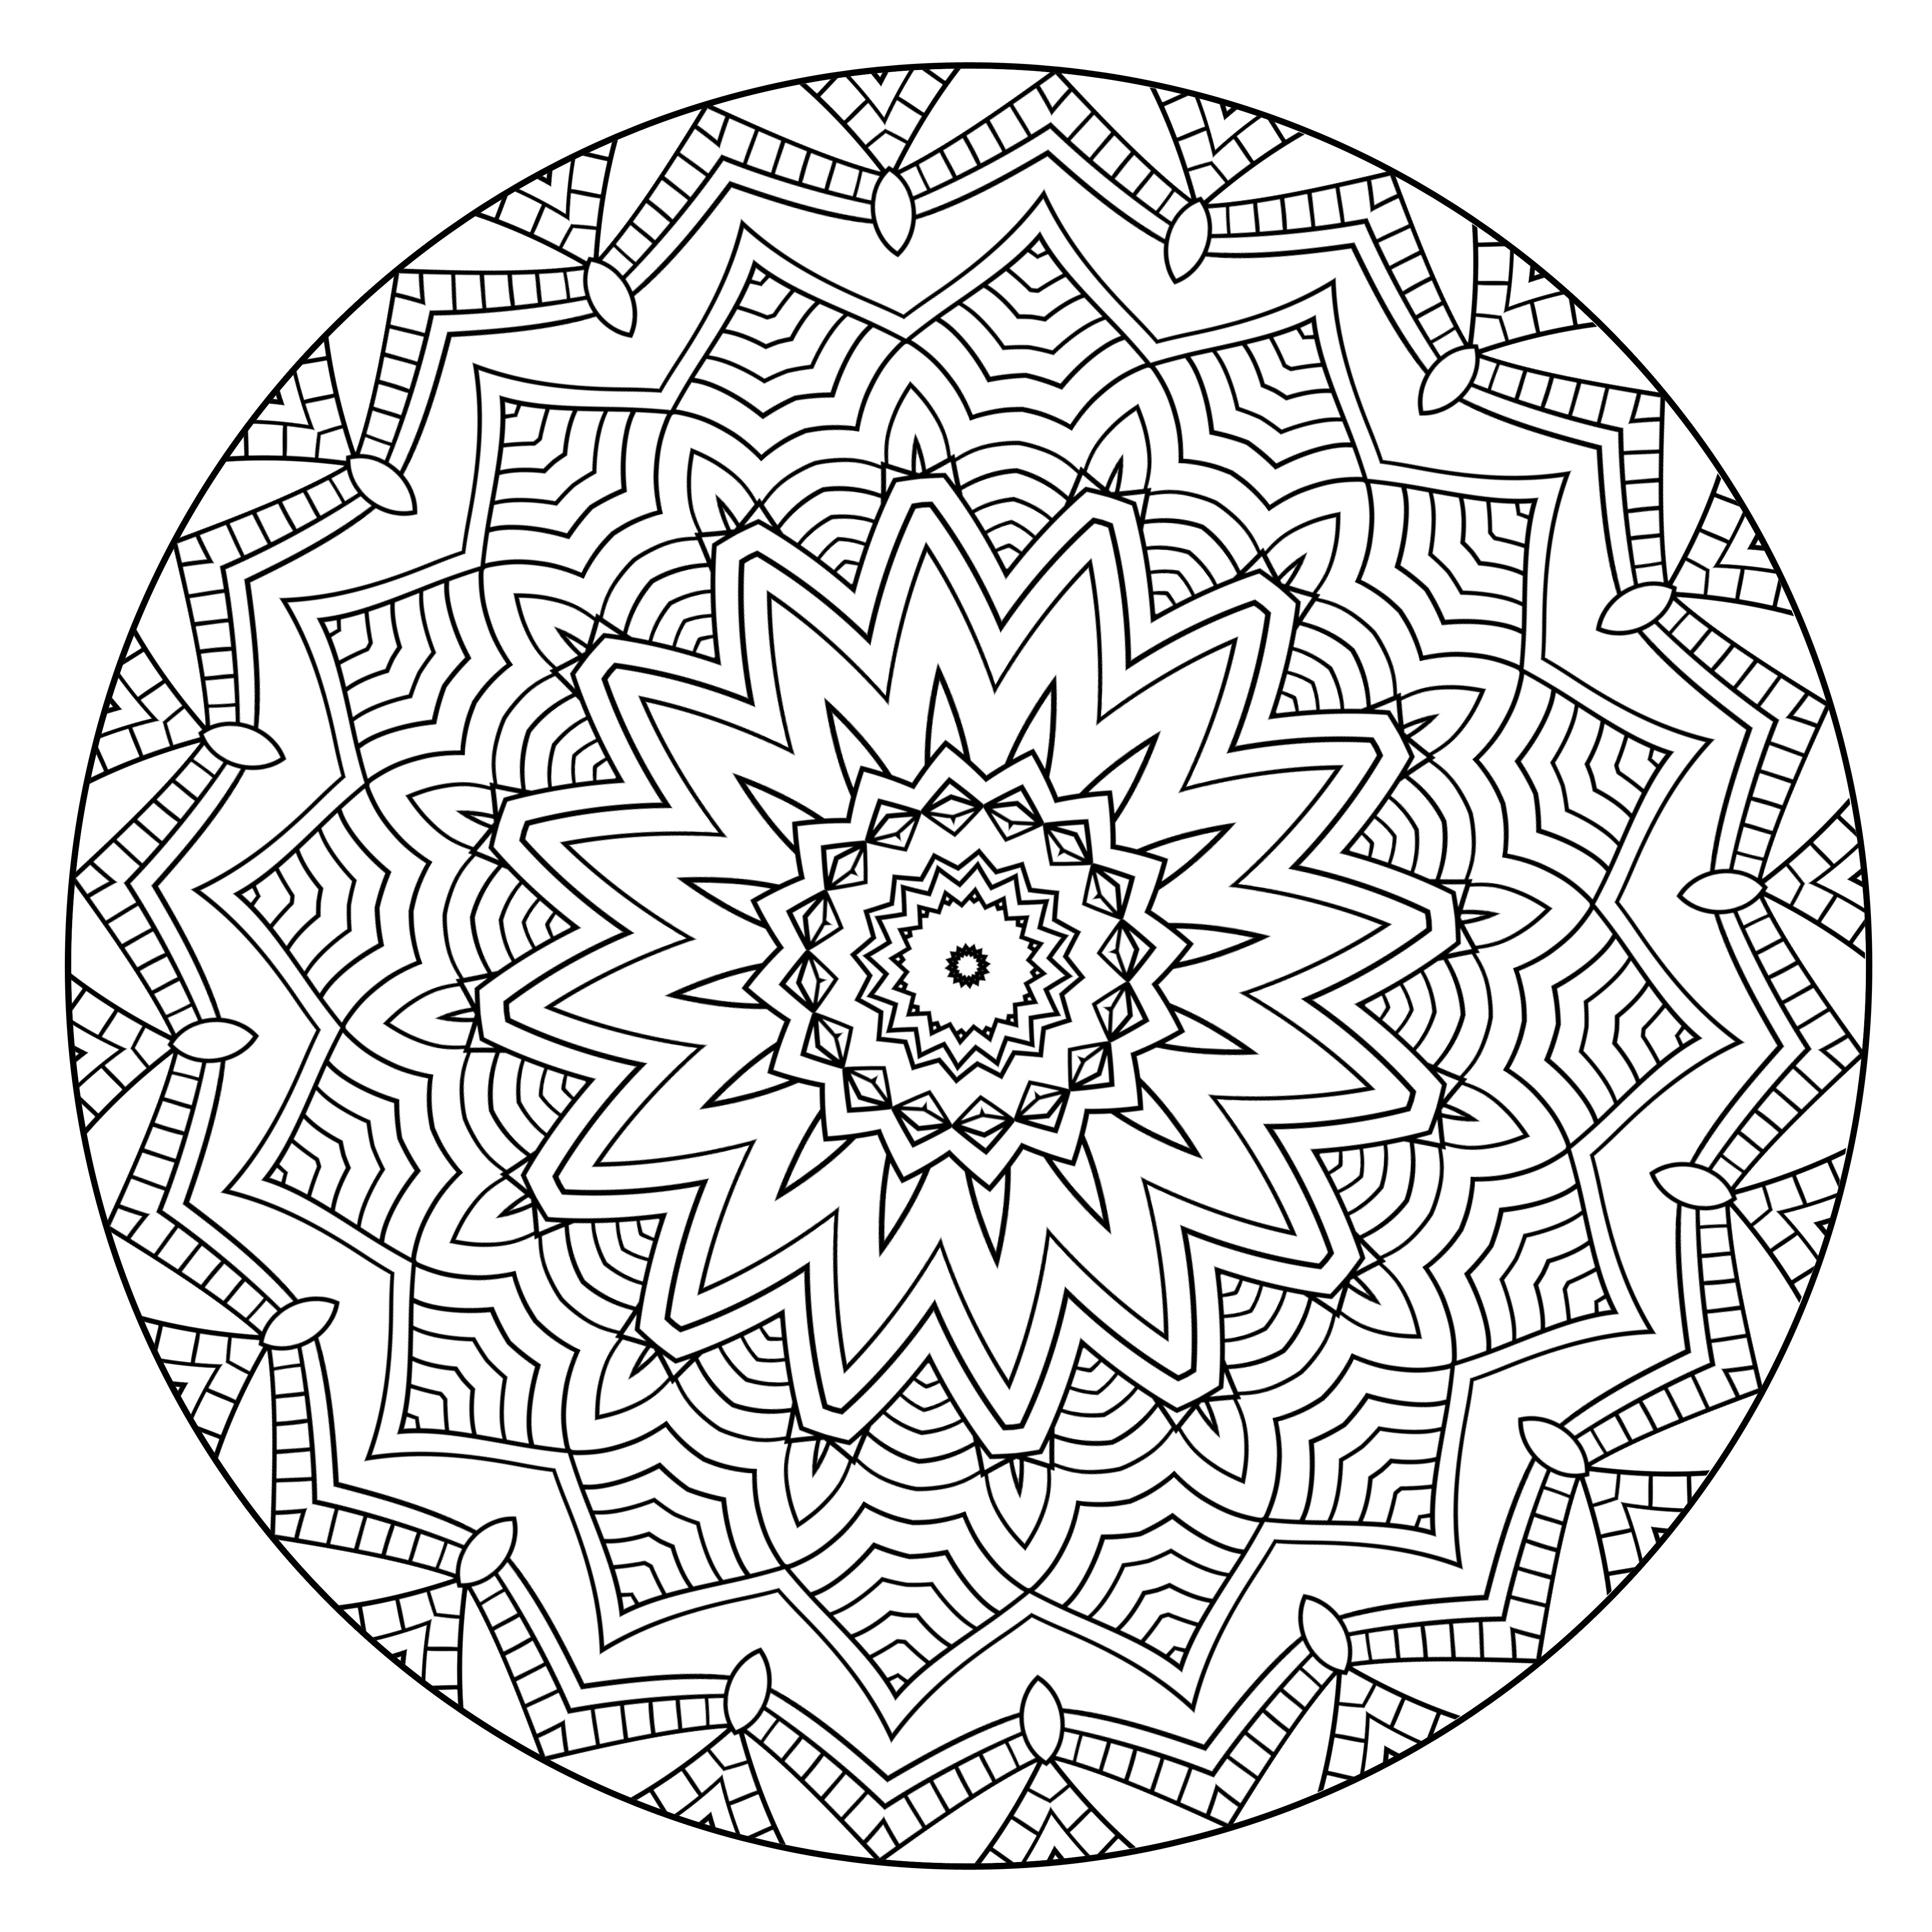 Coloring to Calm, Volume One – Mandalas